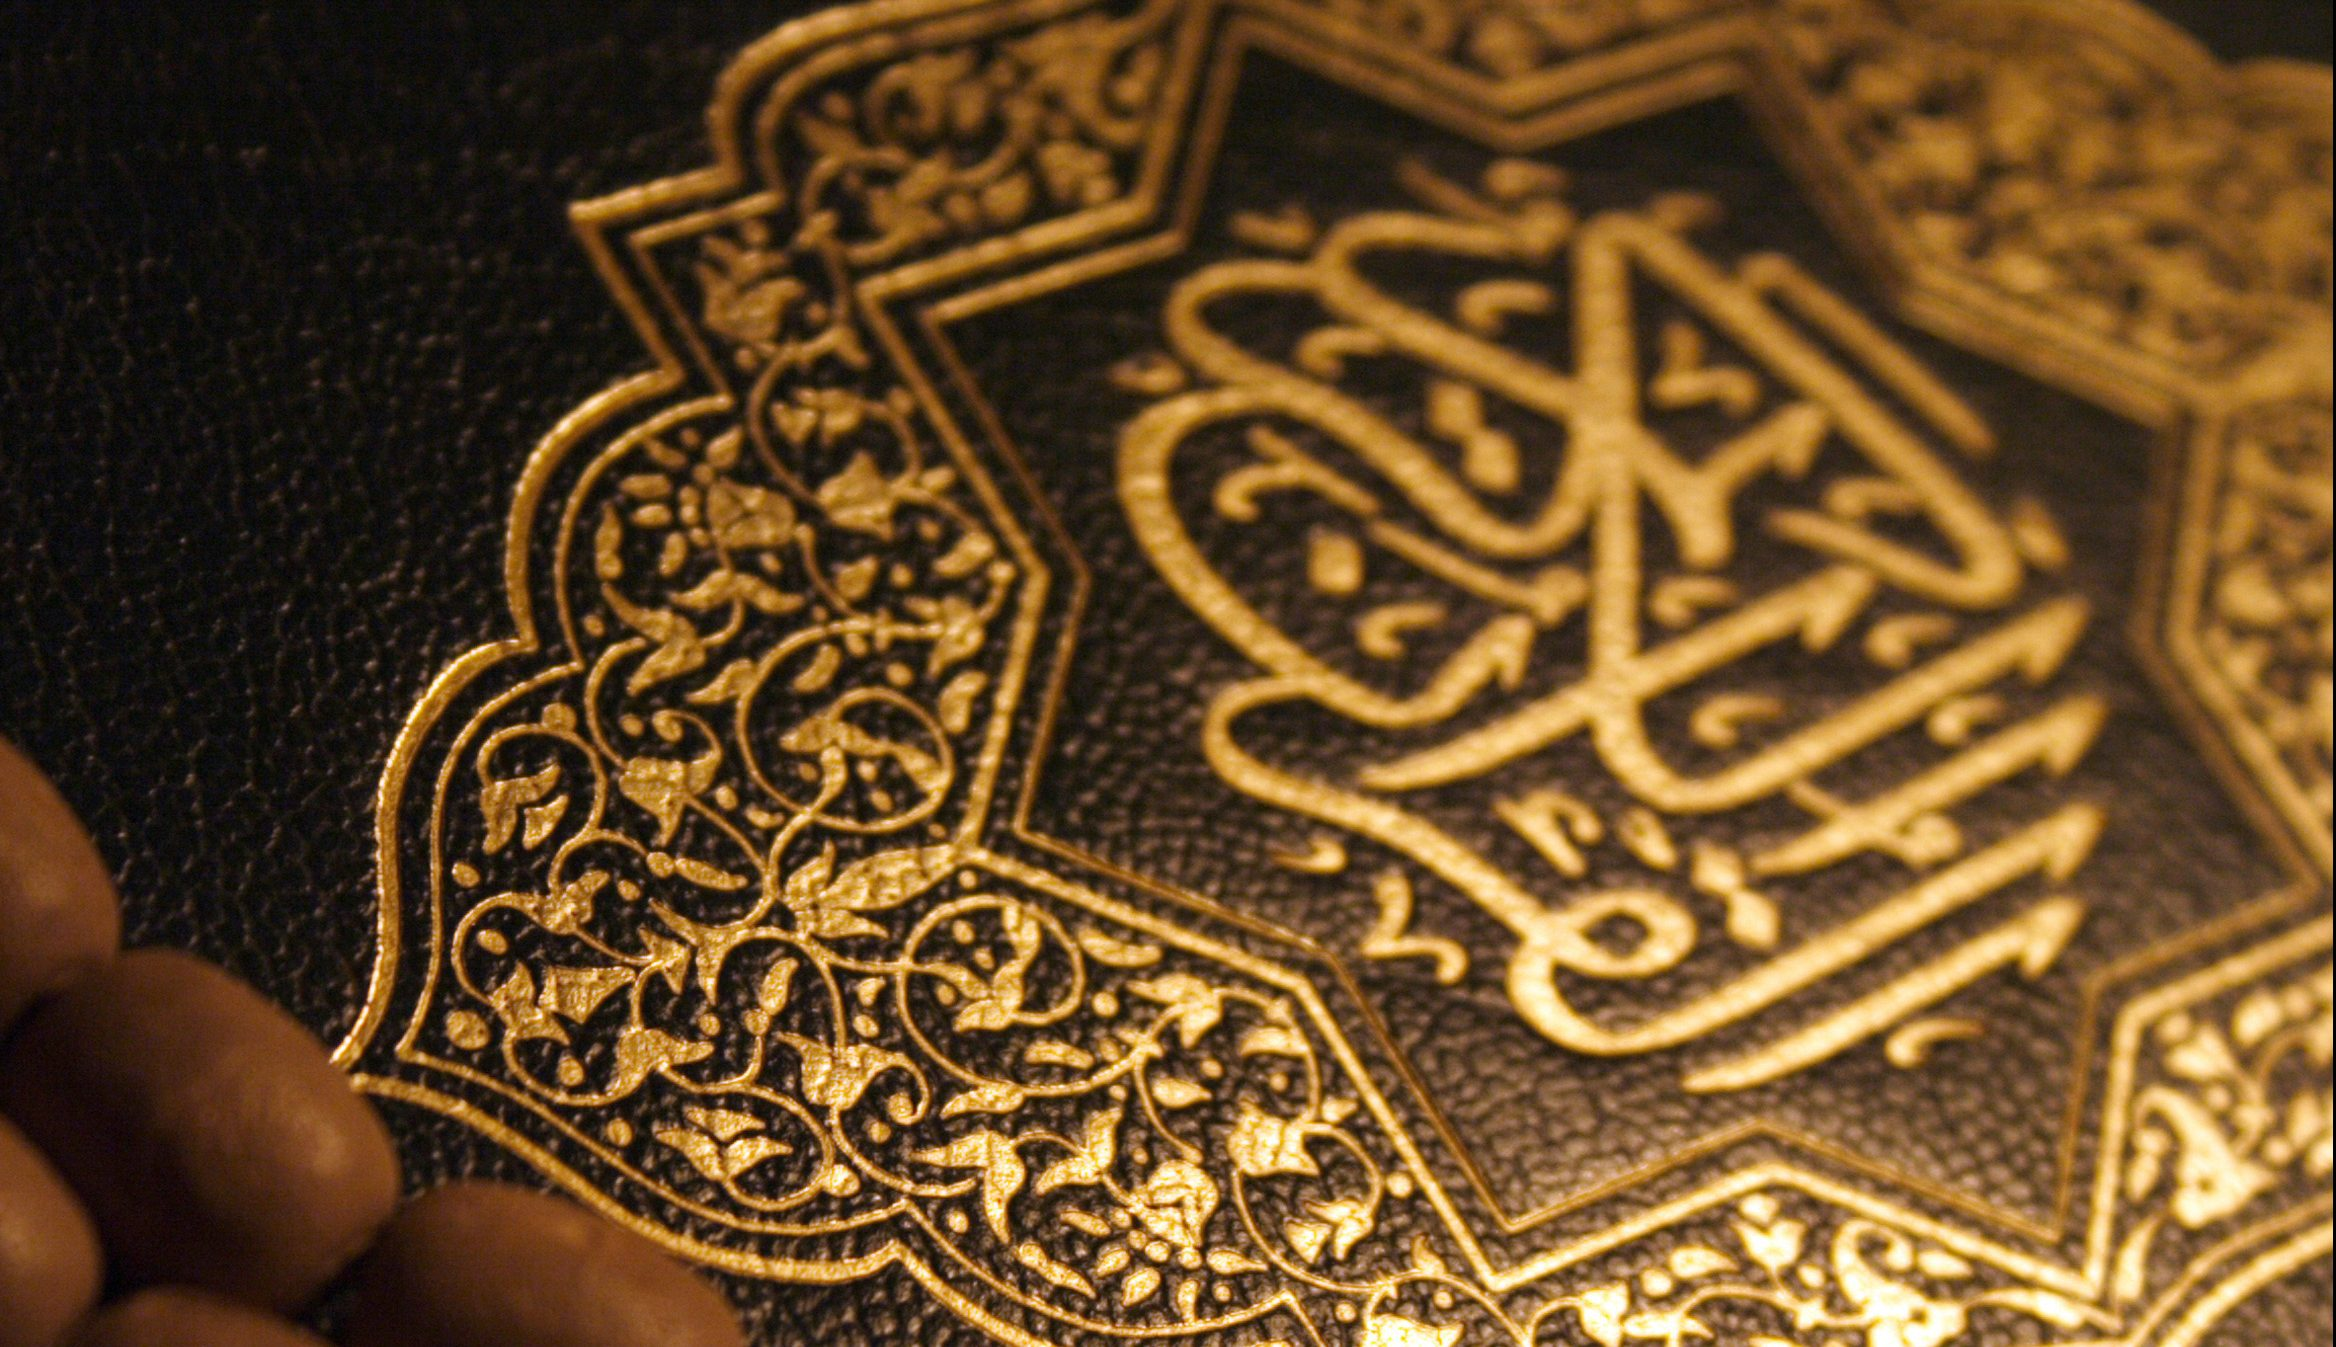 Preinaka Kur'ana i sunnet